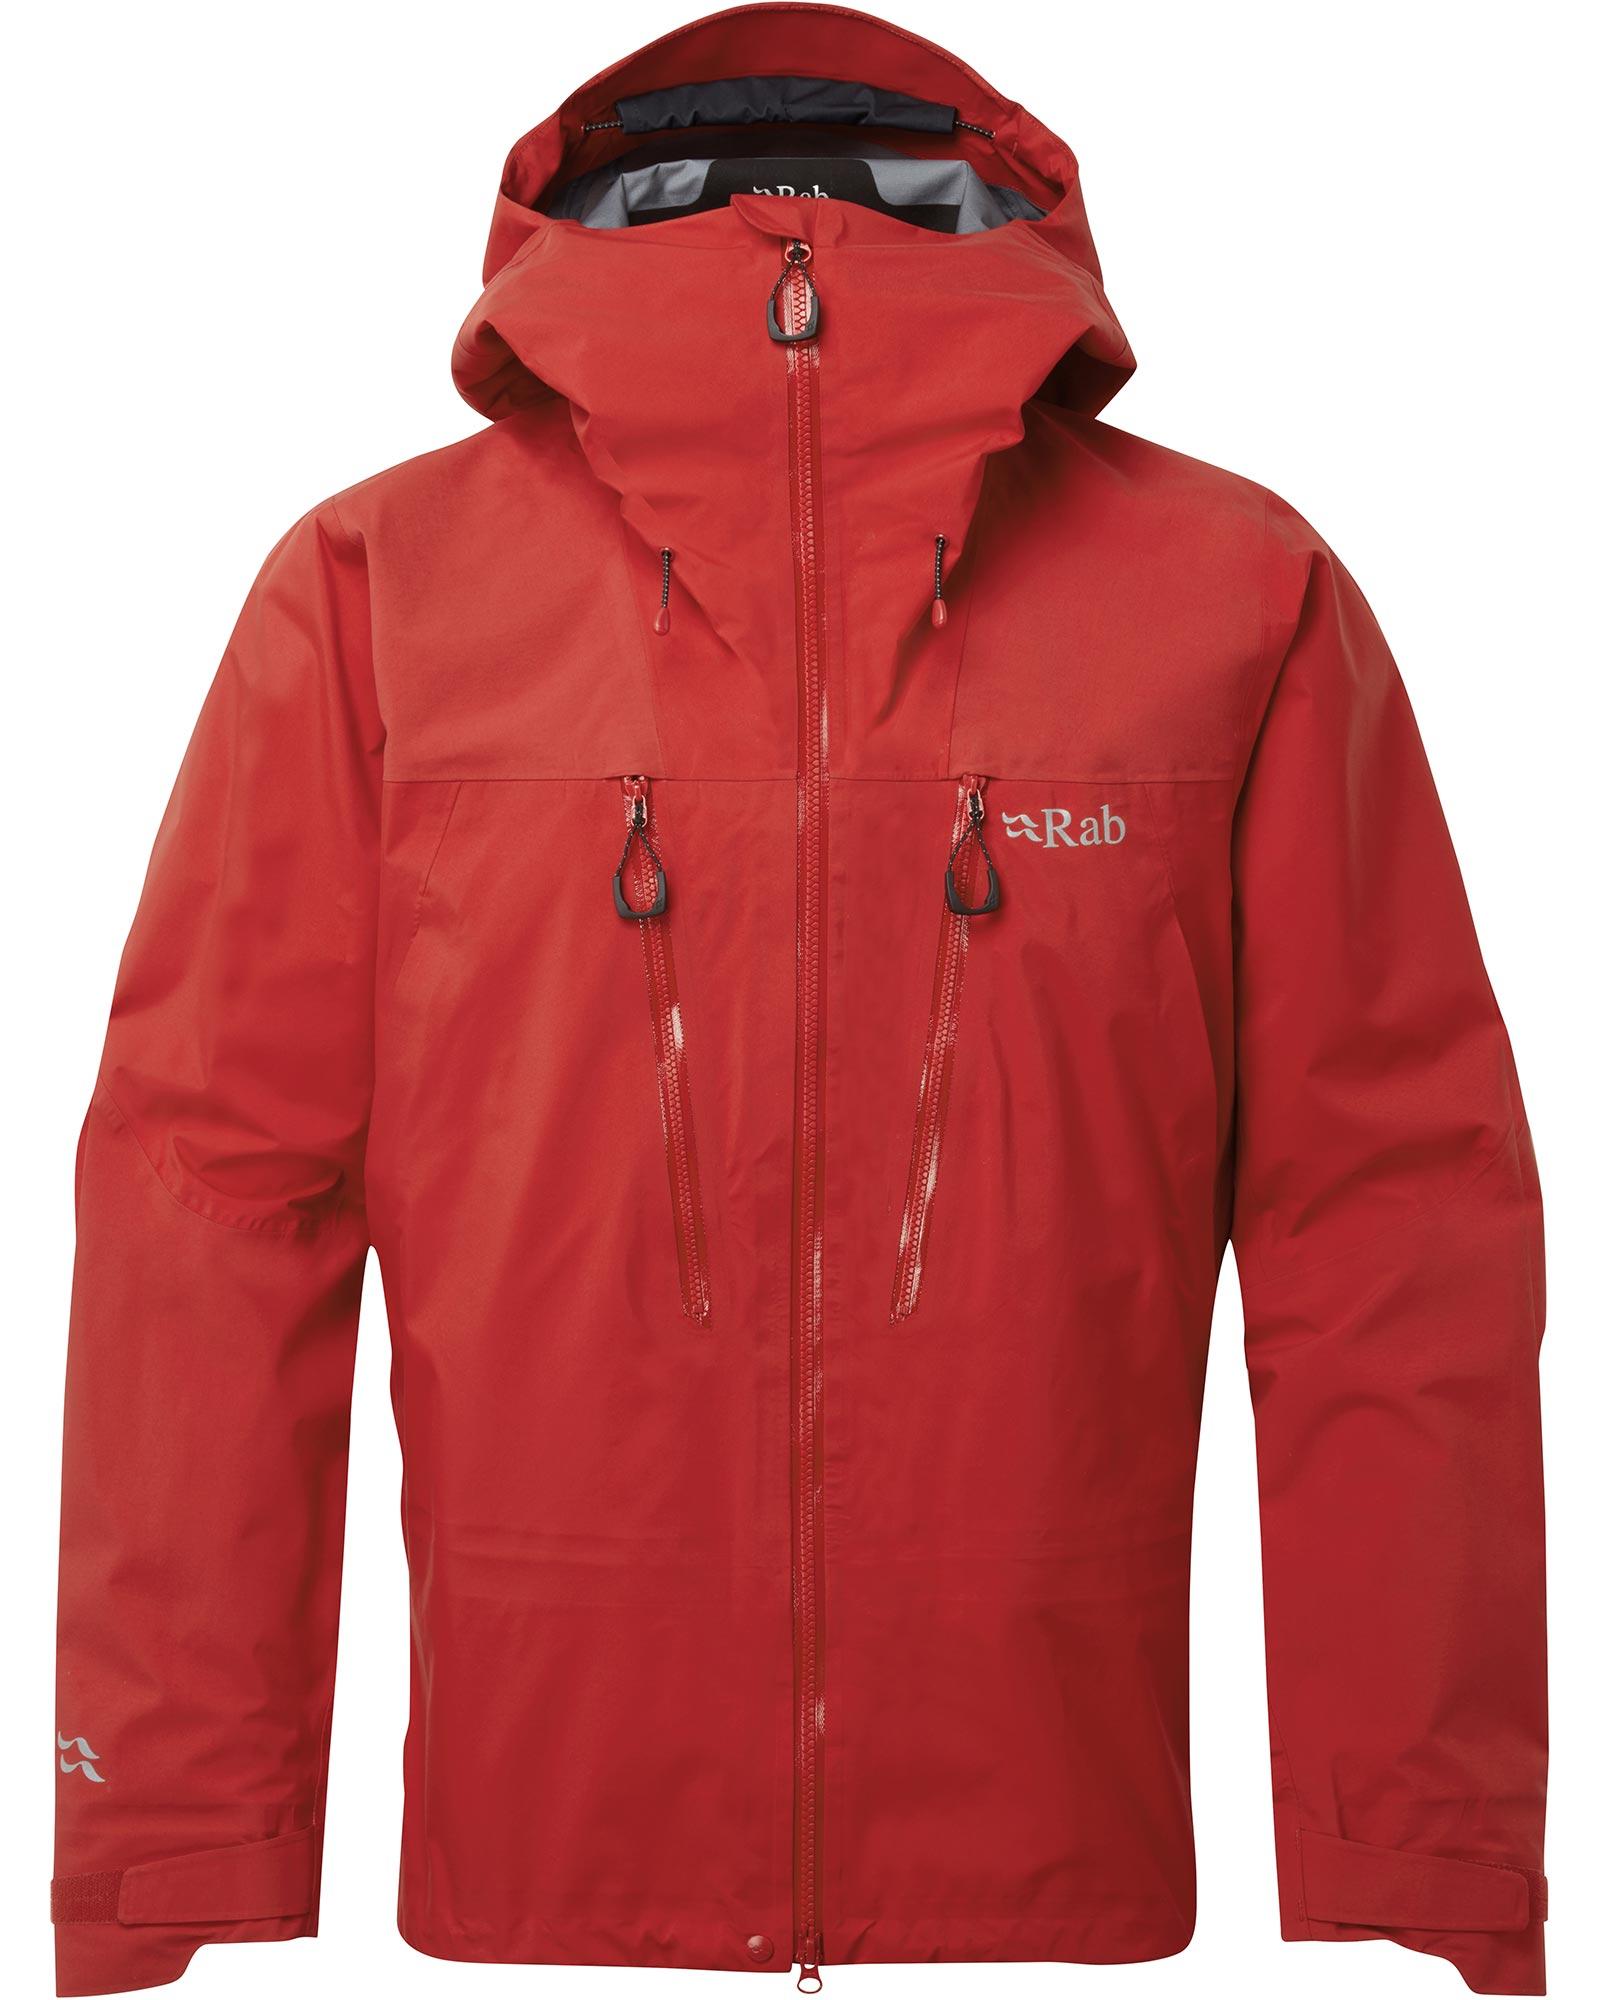 Rab Men's Latok GORE-TEX Jacket 0